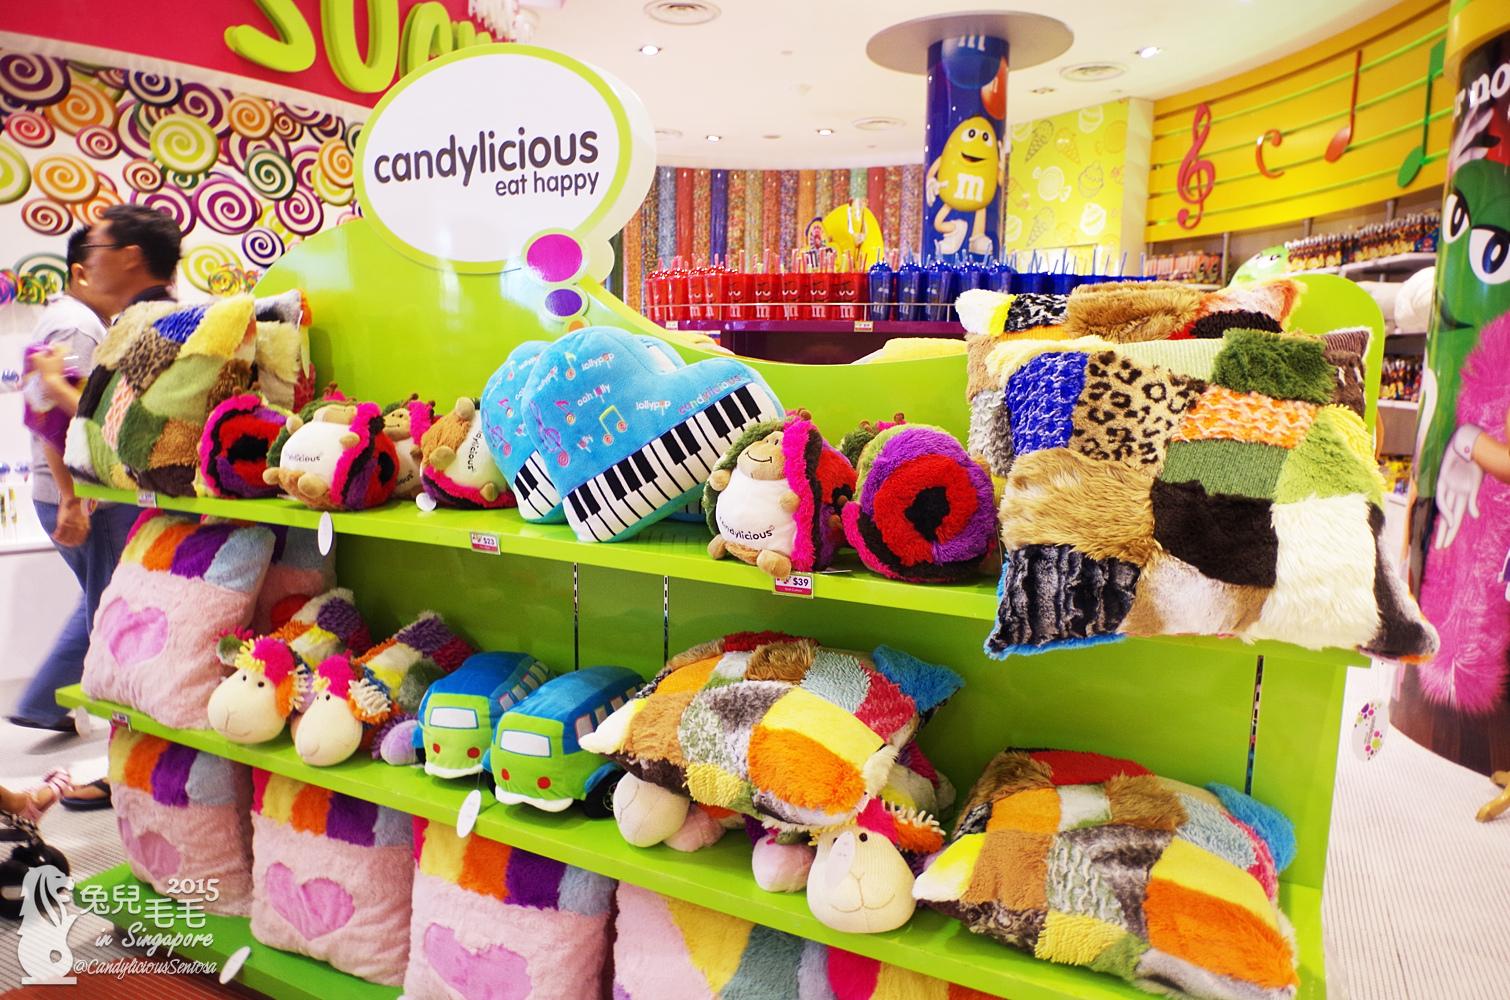 0215-Candylicious-11.jpg